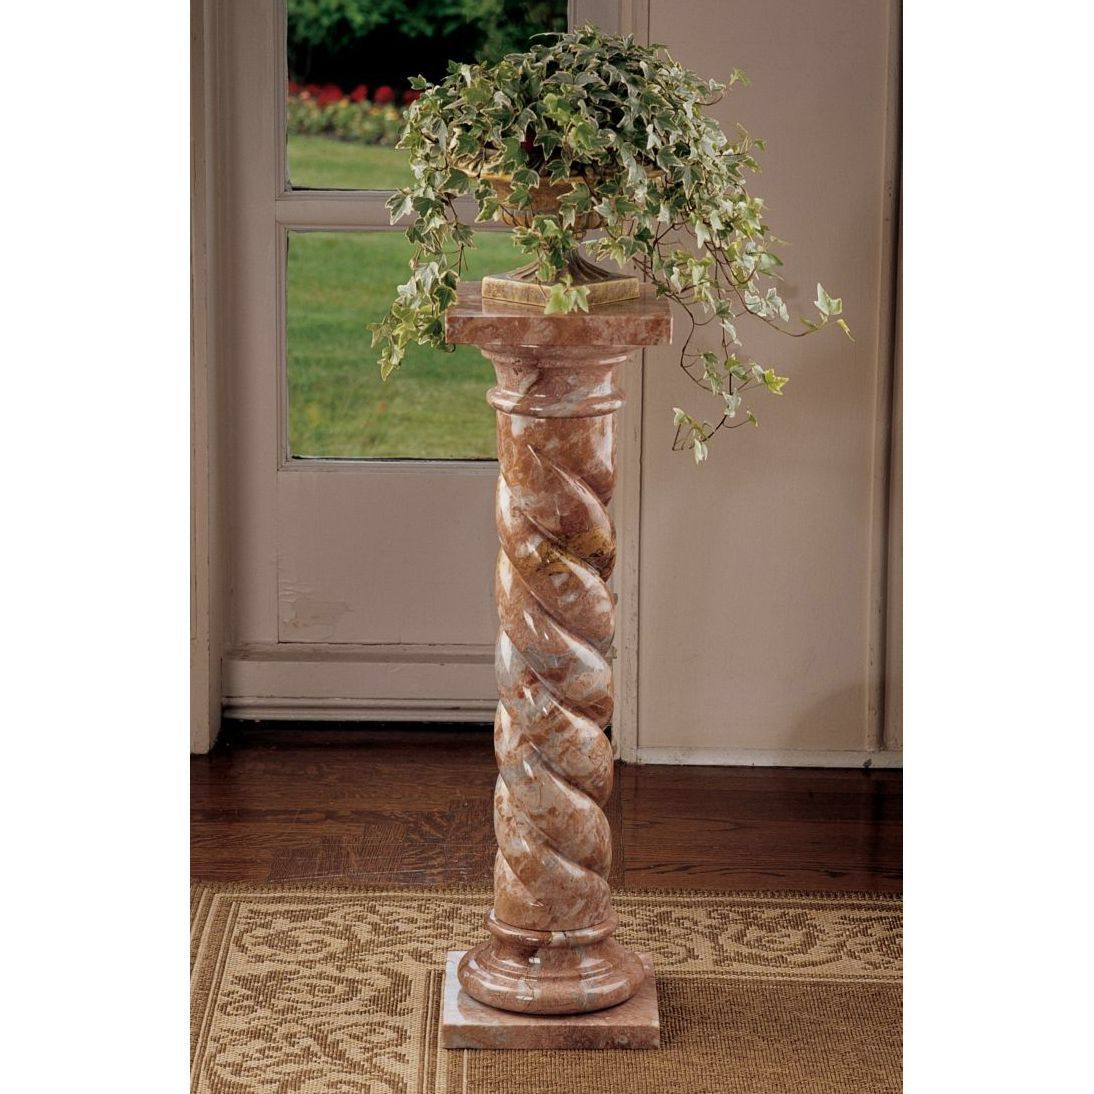 Venetian Doges Pedestal Plant Stand Marble Columns Design Toscano Venetian Mirrors